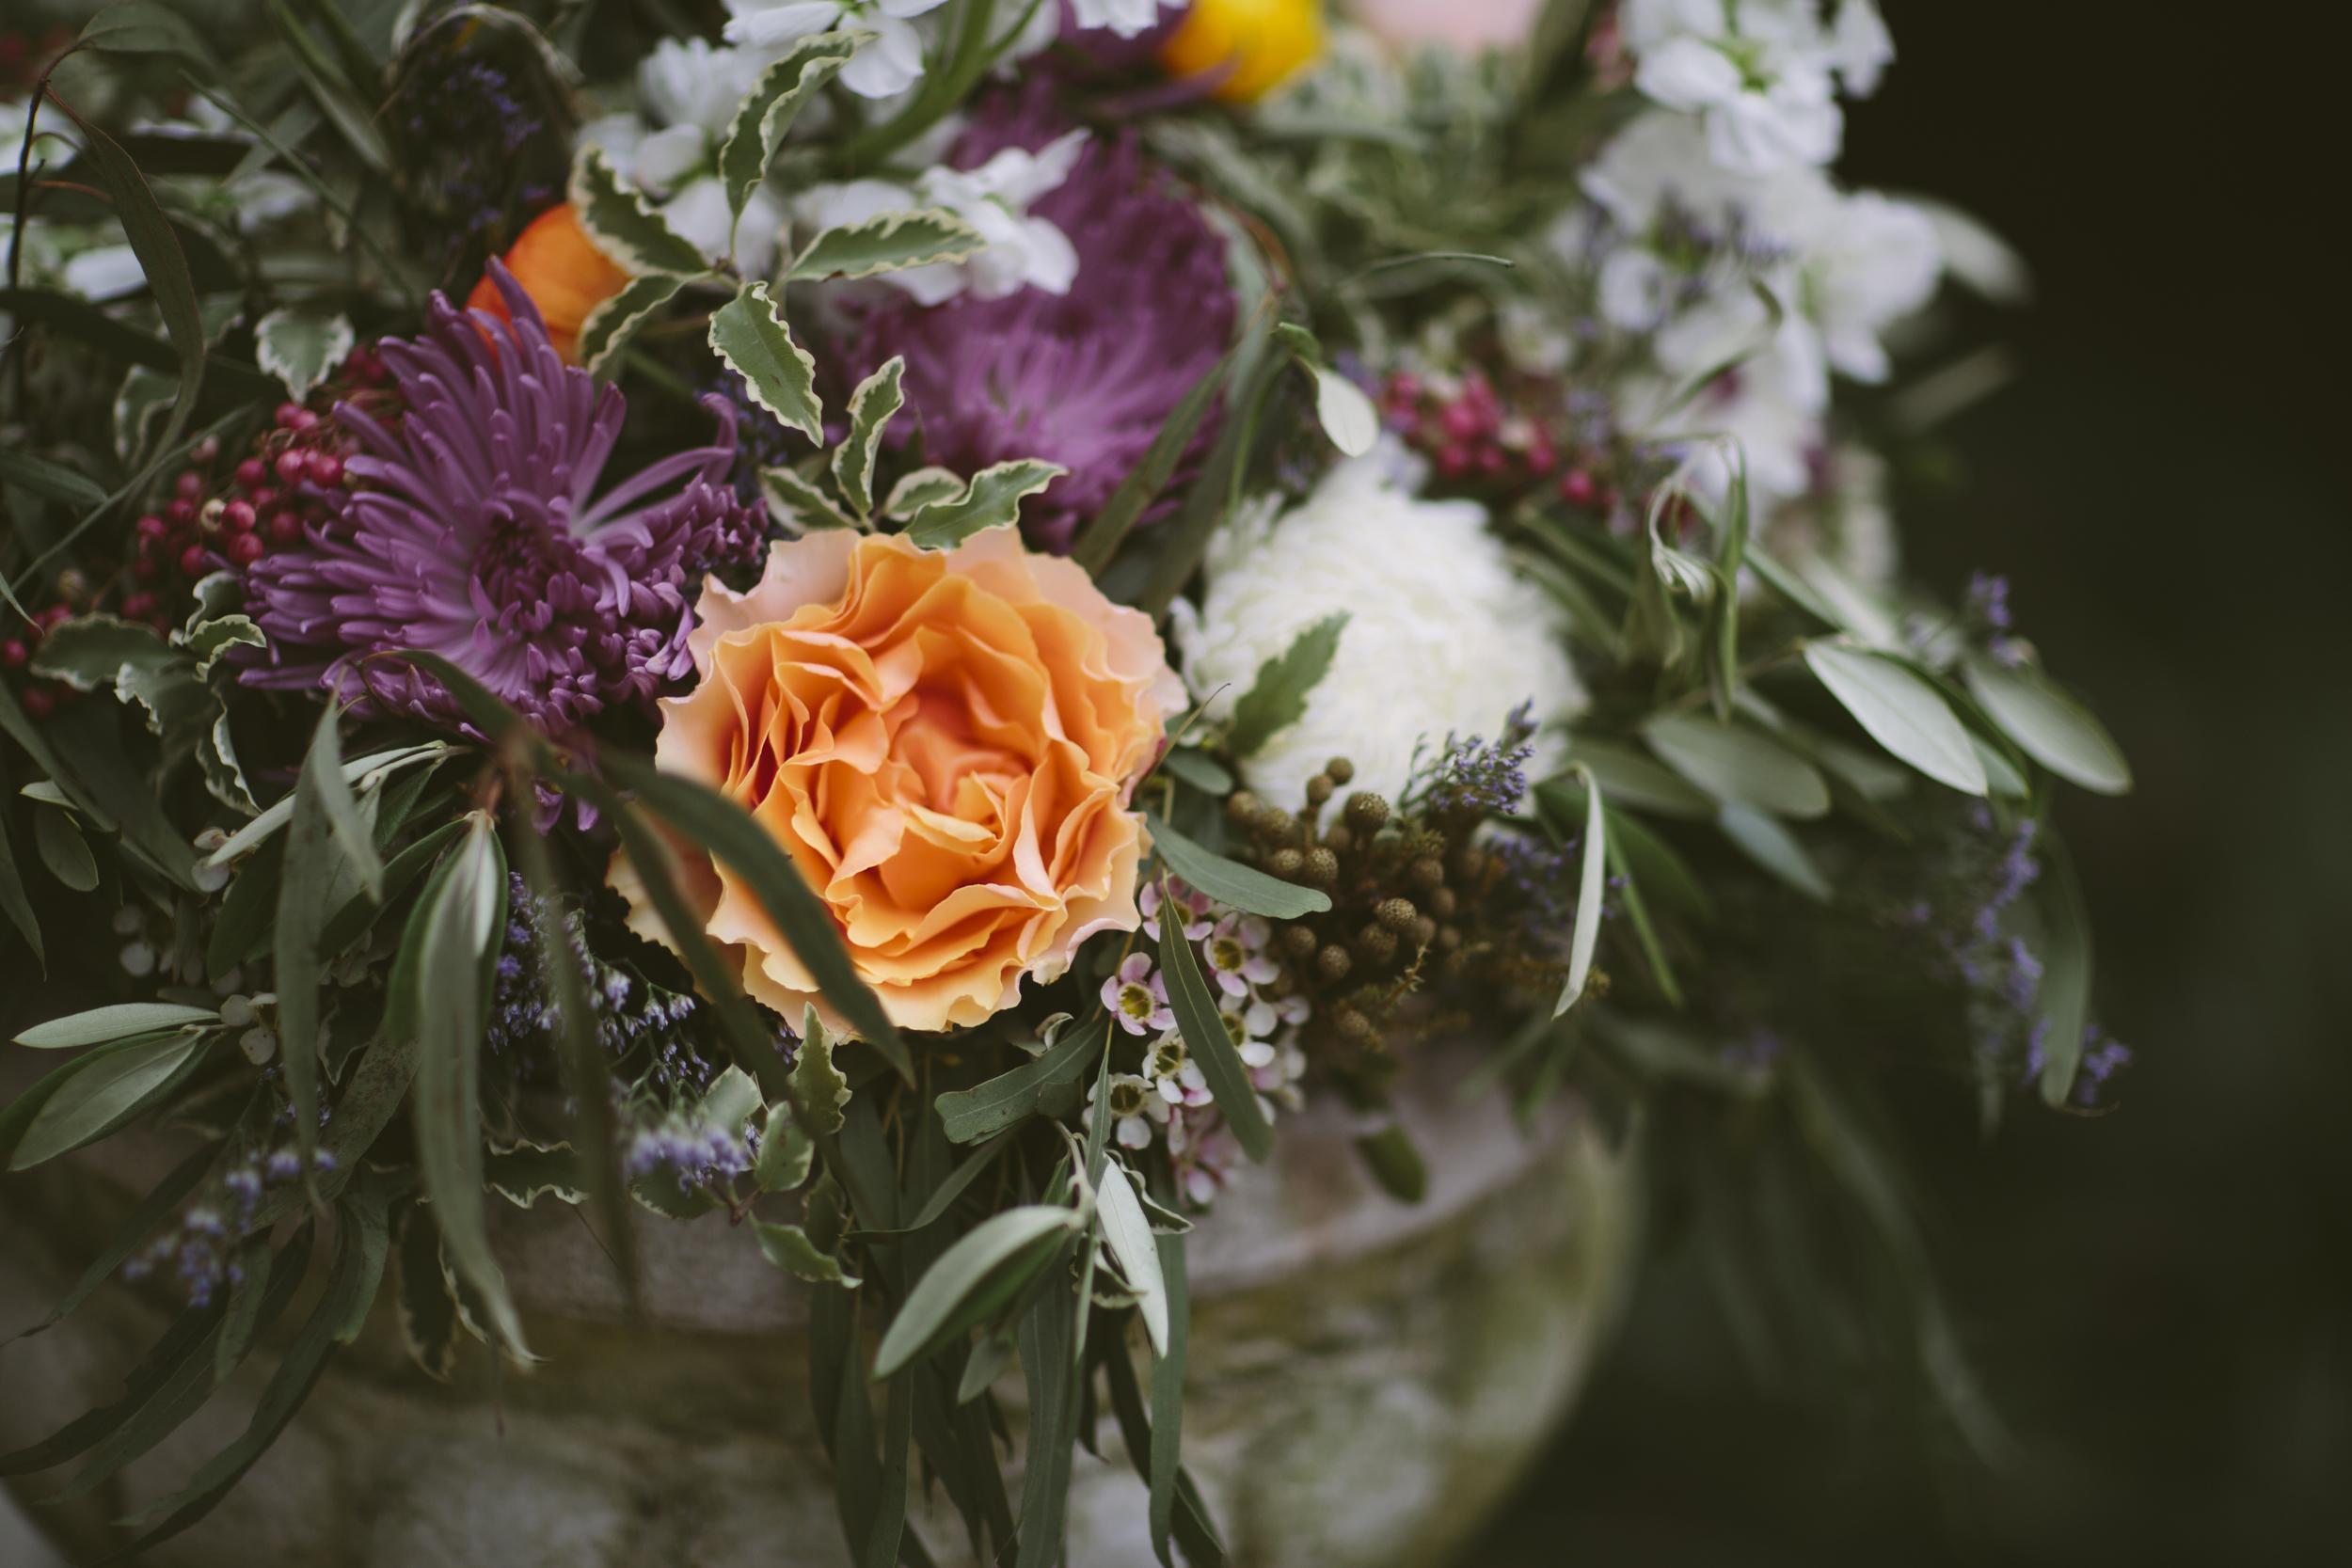 Peach Garden Roses, lavender mums, and lush greenery // Nashville Wedding Flowers